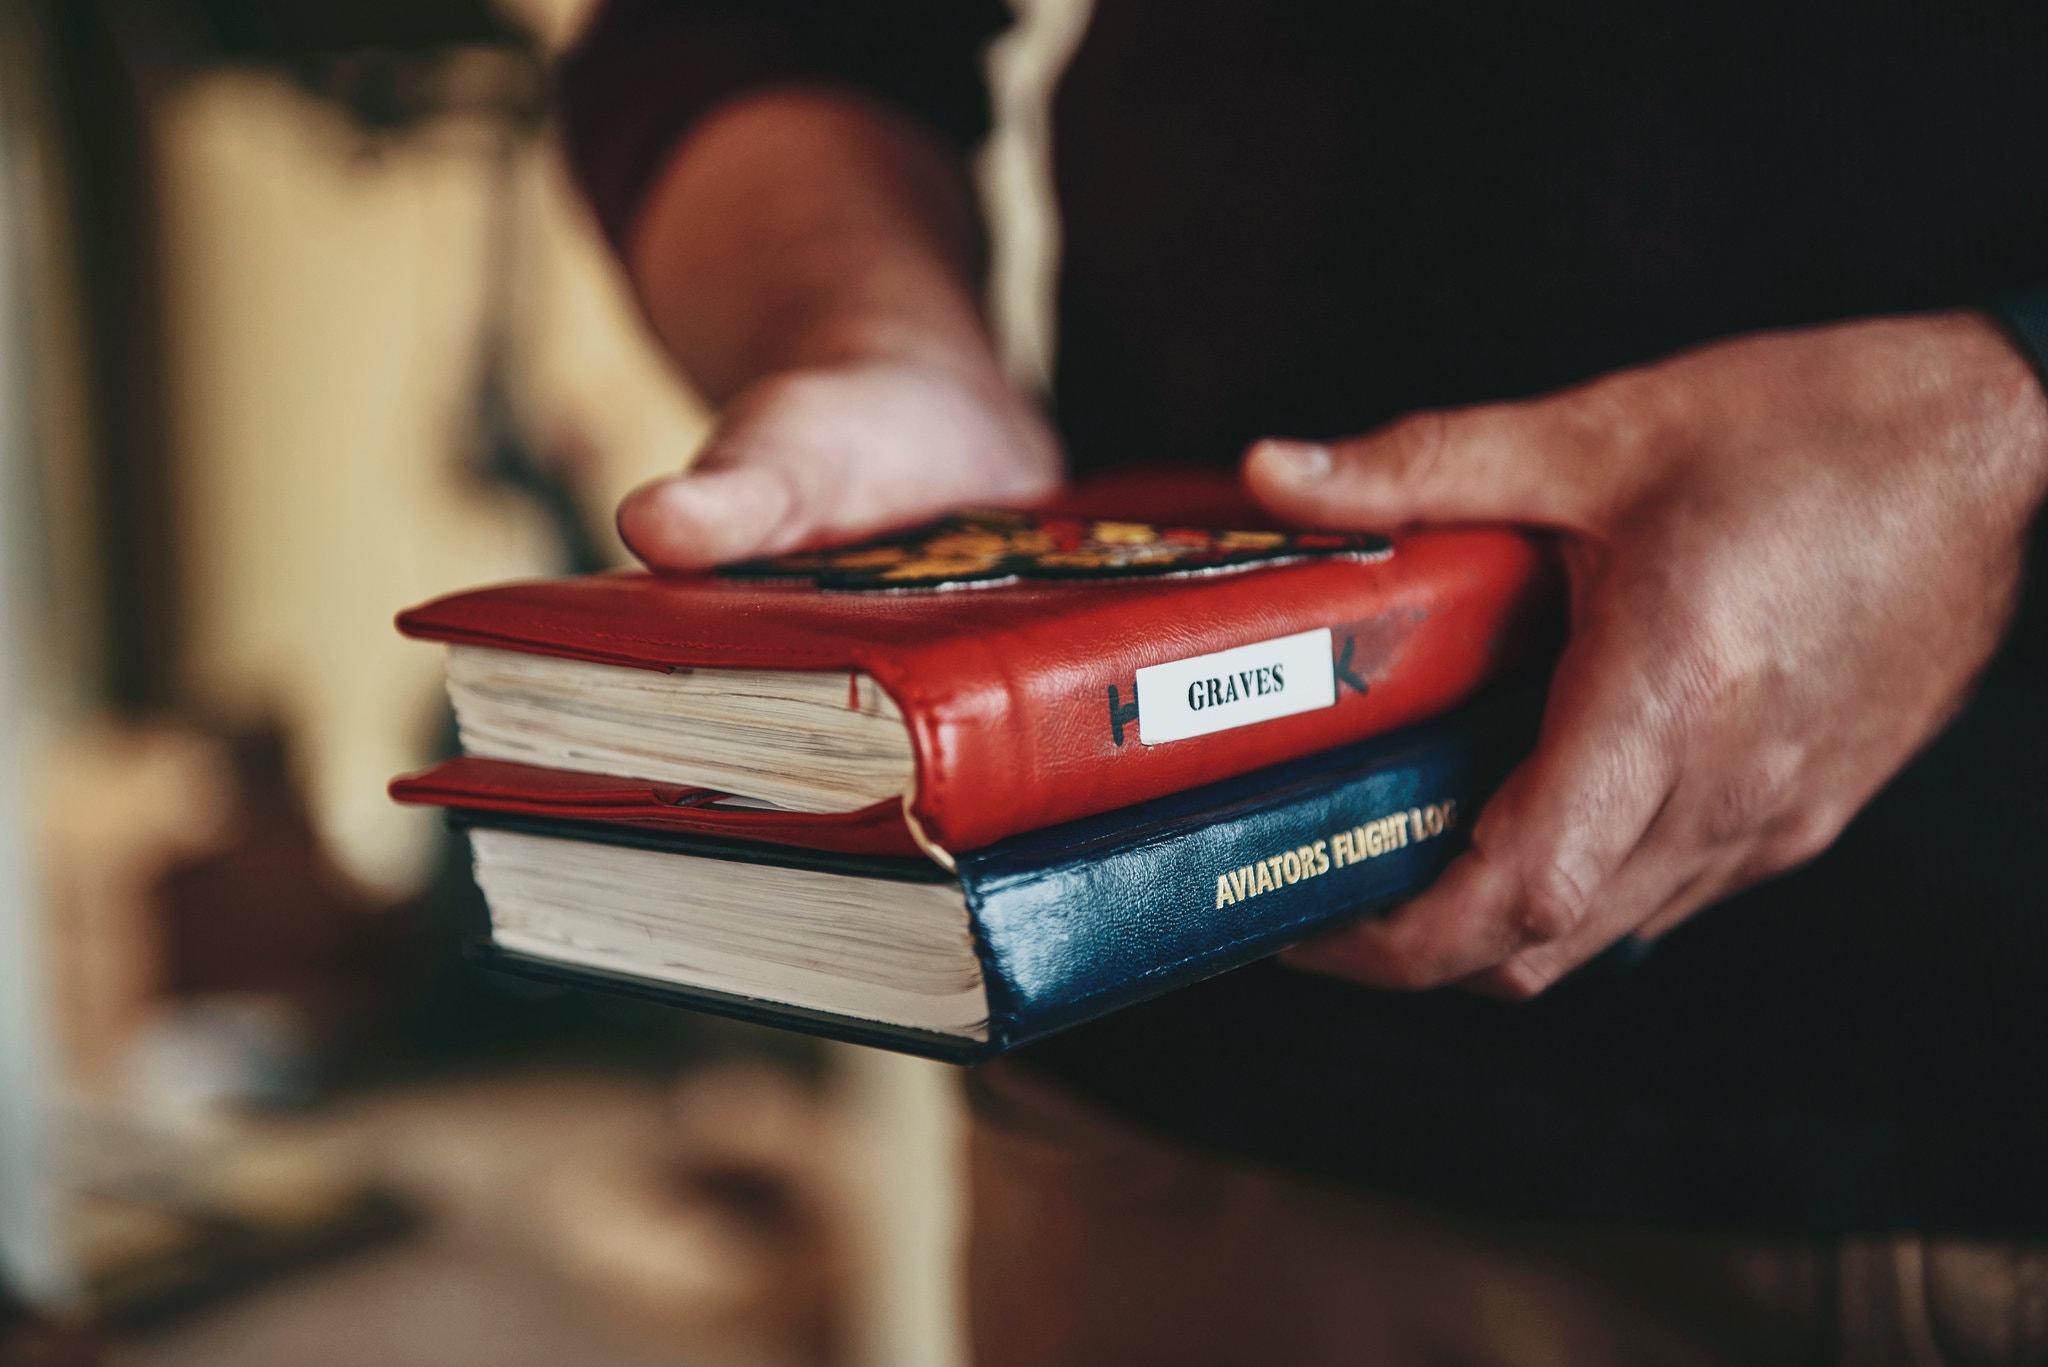 Lieutenant Graves with Navy flight log books.